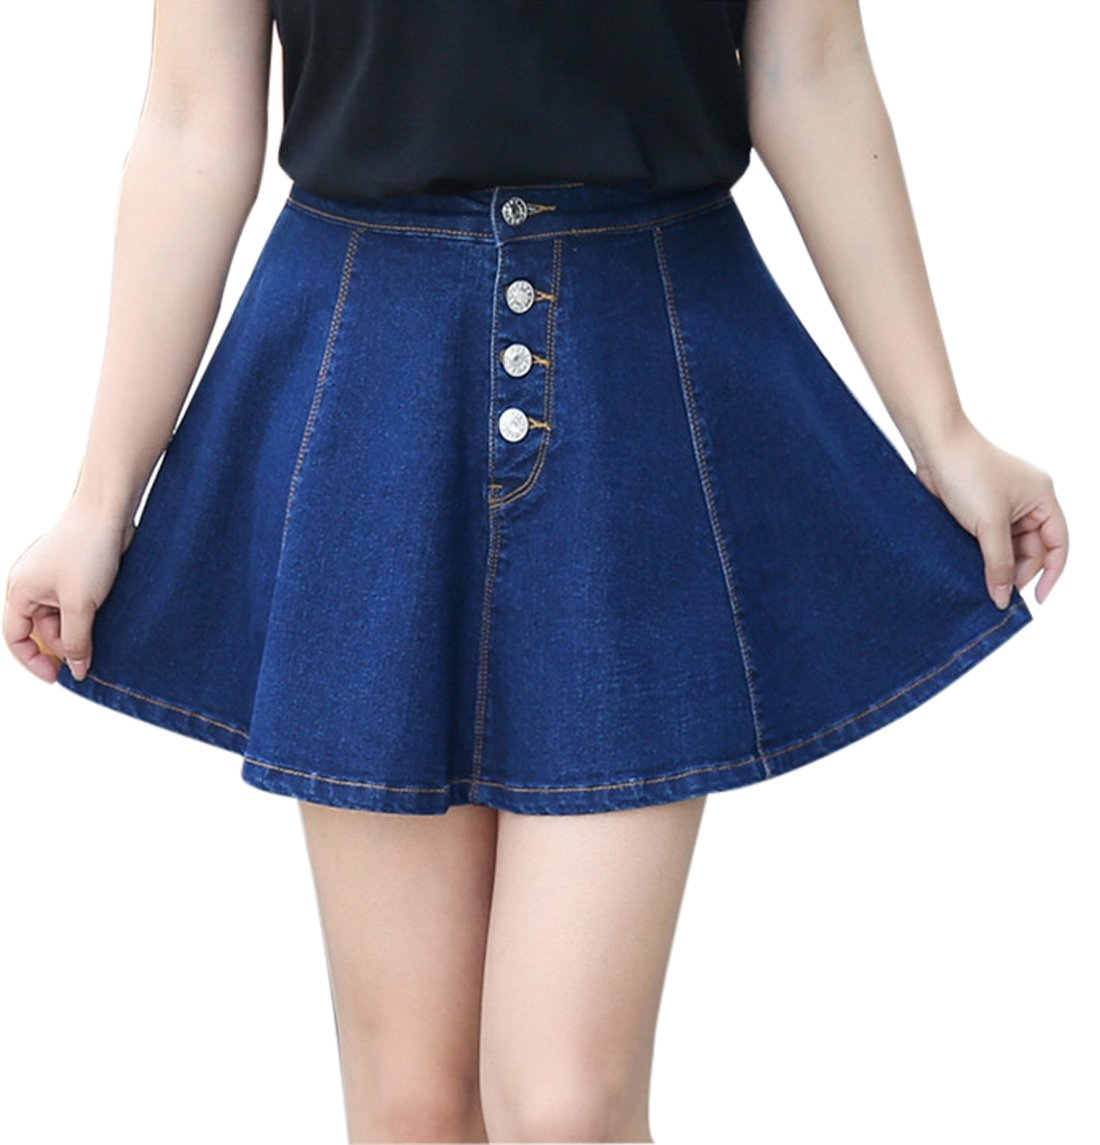 Gihuo Women's Casual Button Front Denim A-Line Pleated Short Denim Skirt Plus Size (X-L, Blue)